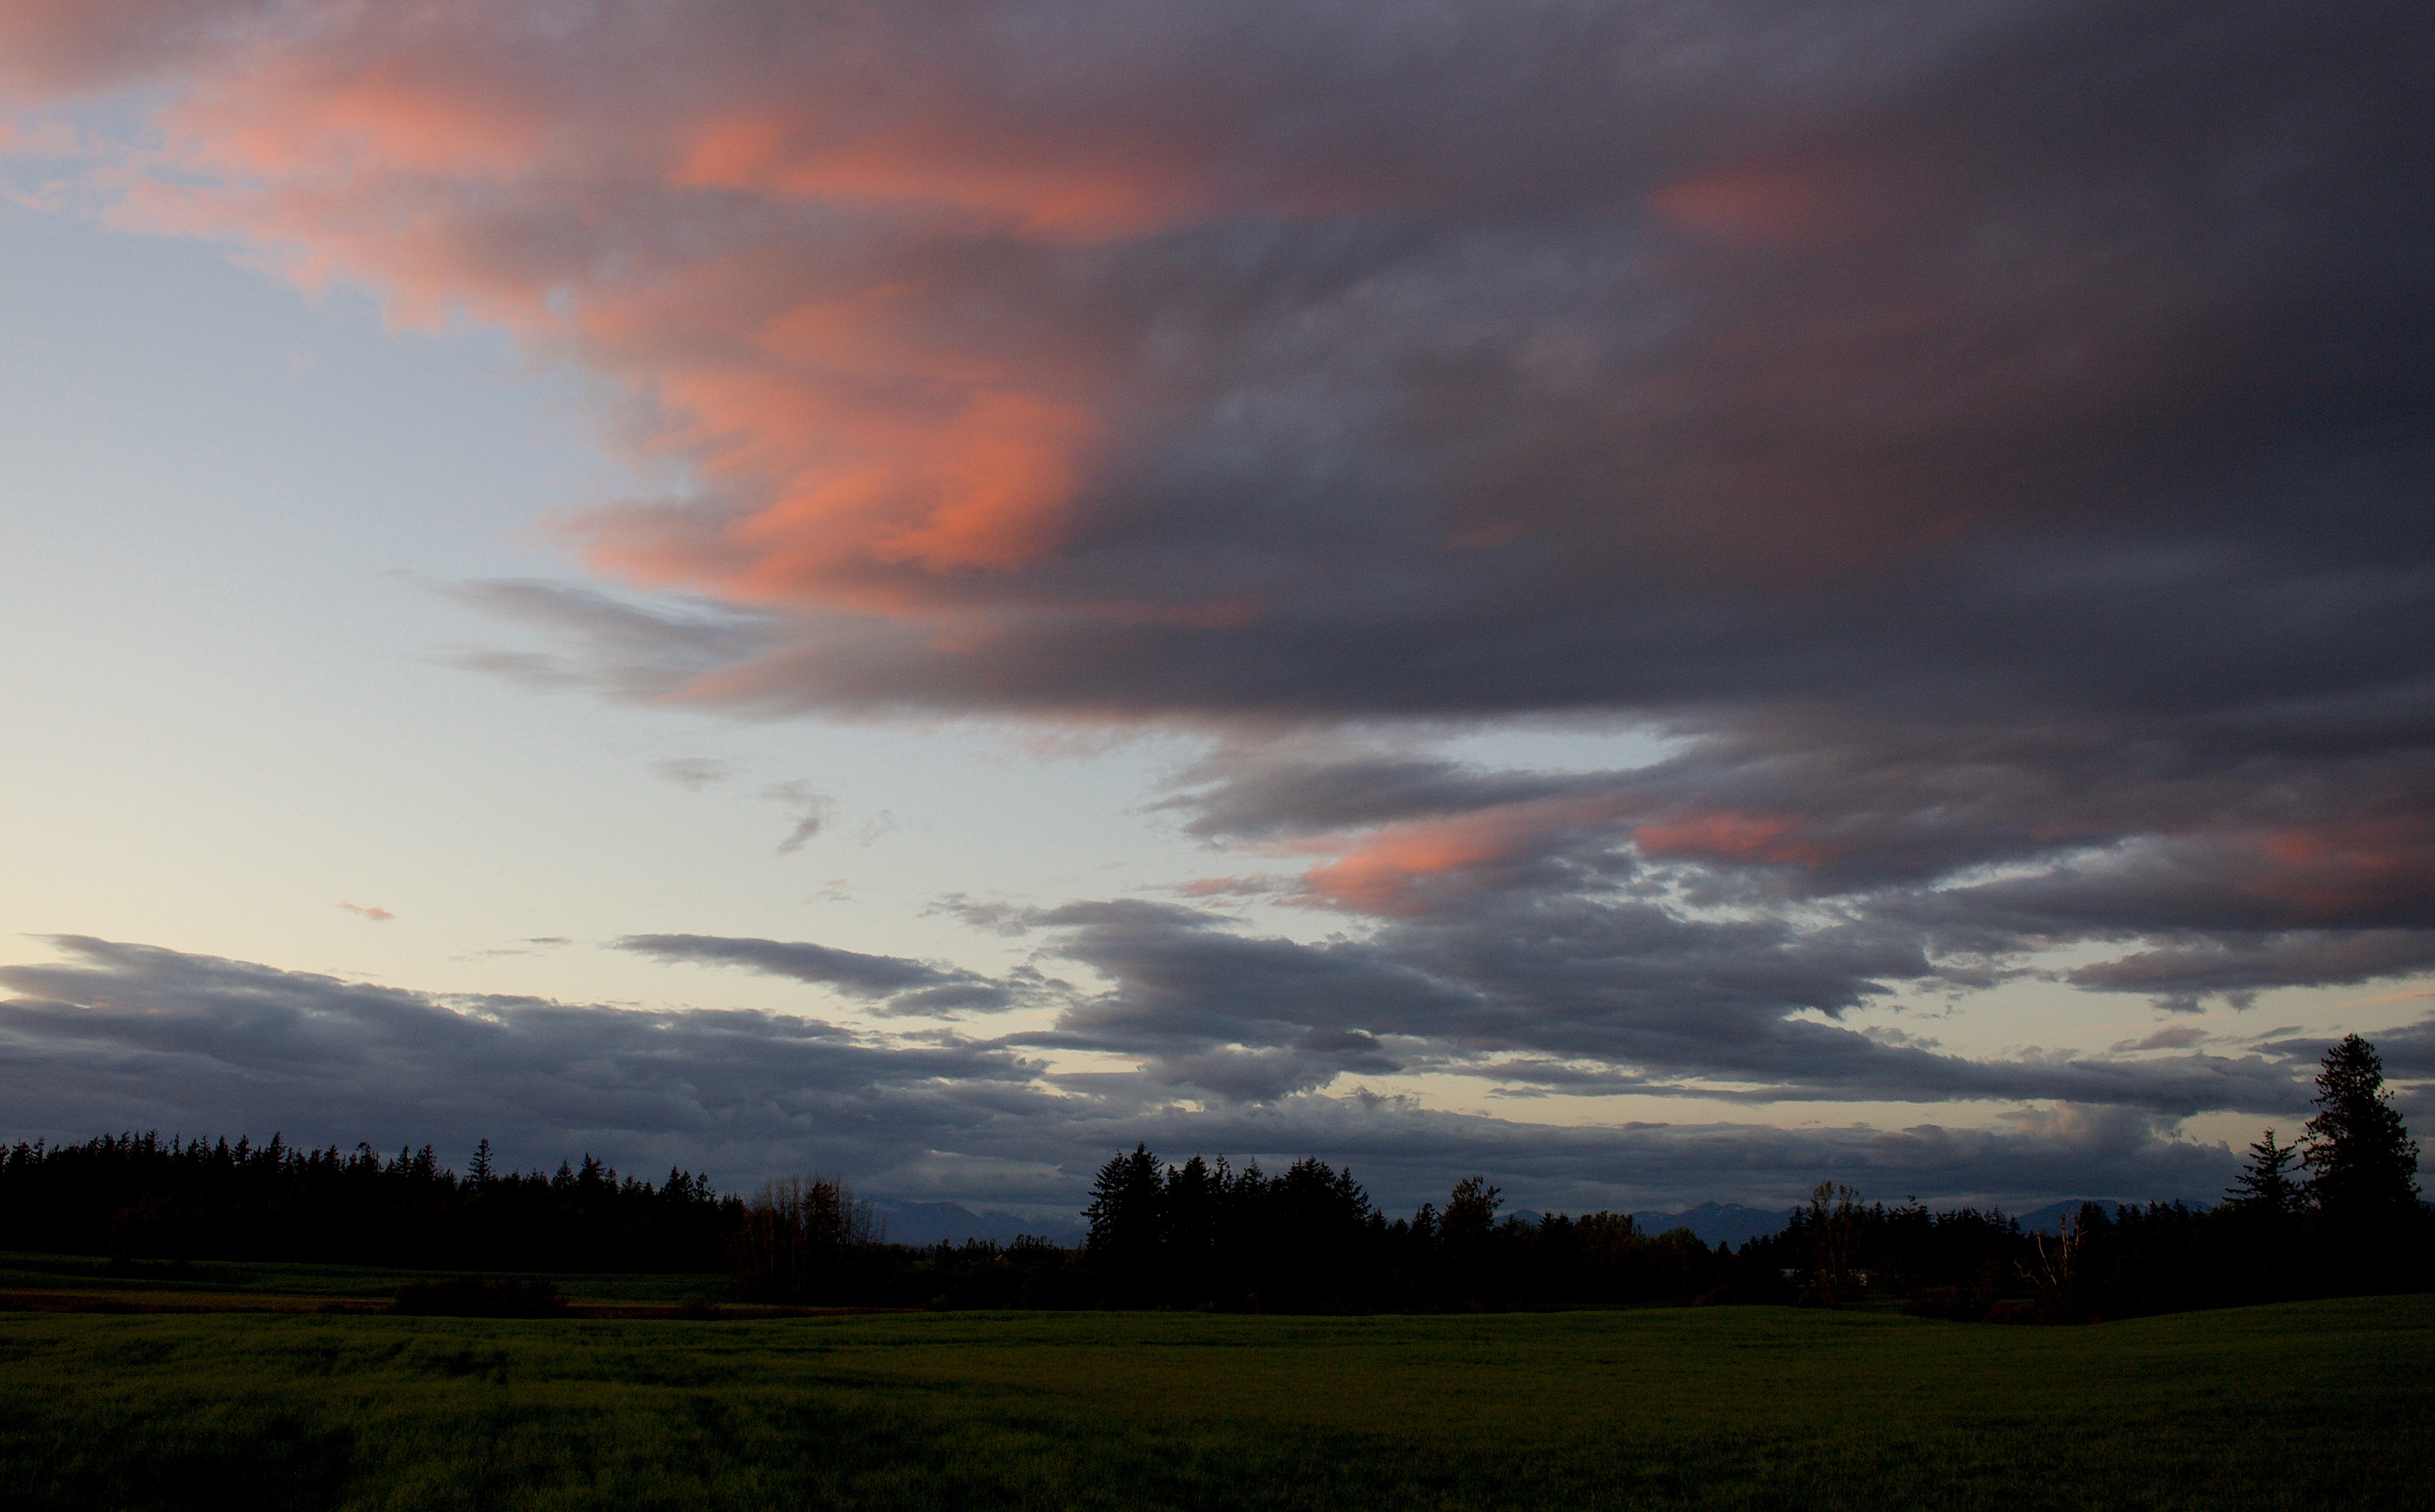 evening43017